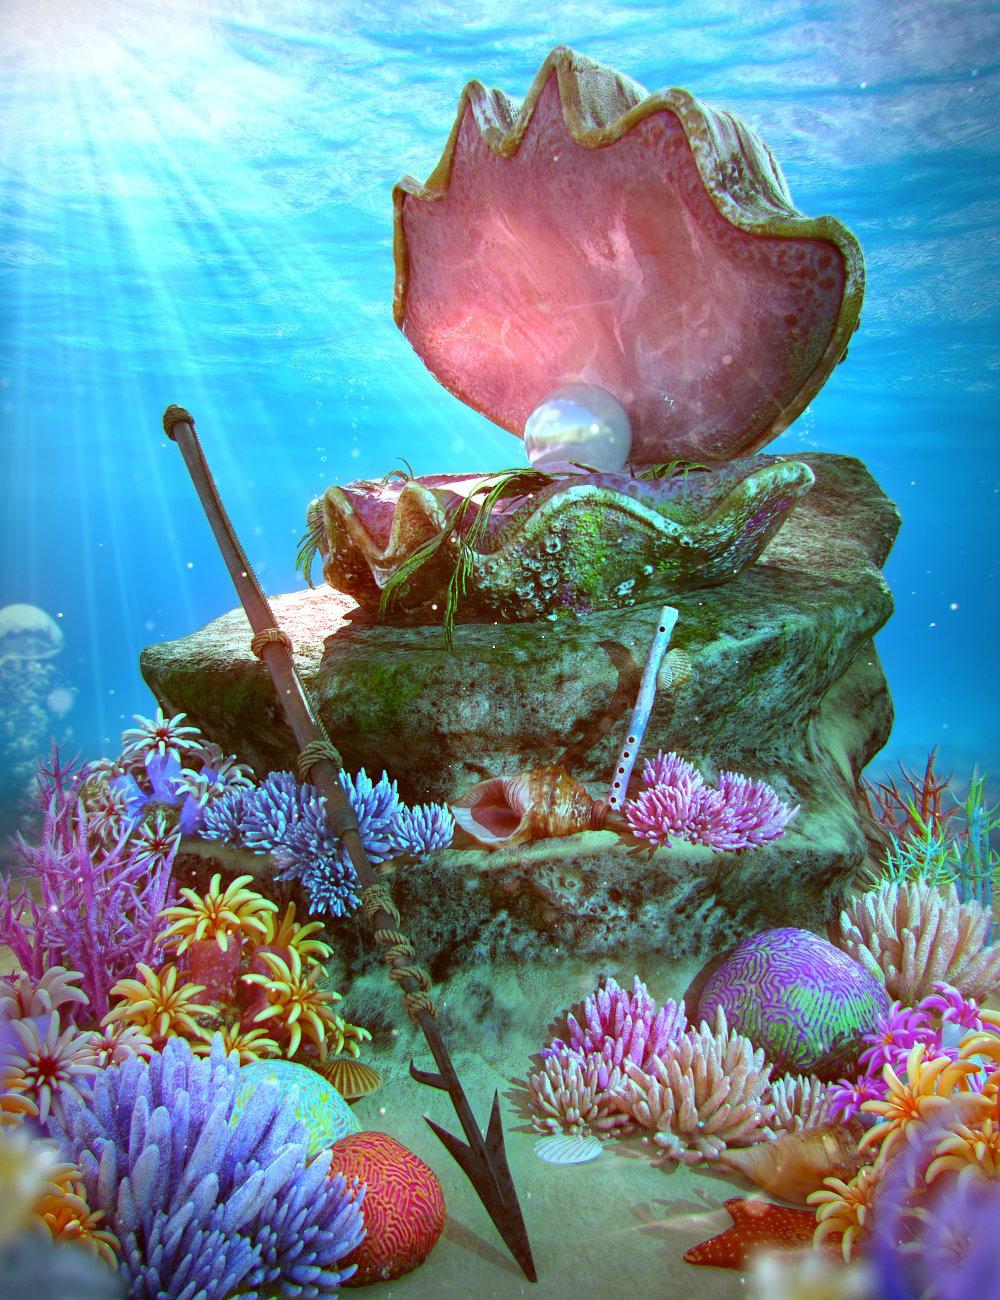 Under the Sea Props for Genesis 8.1 by: ThreeDigital, 3D Models by Daz 3D